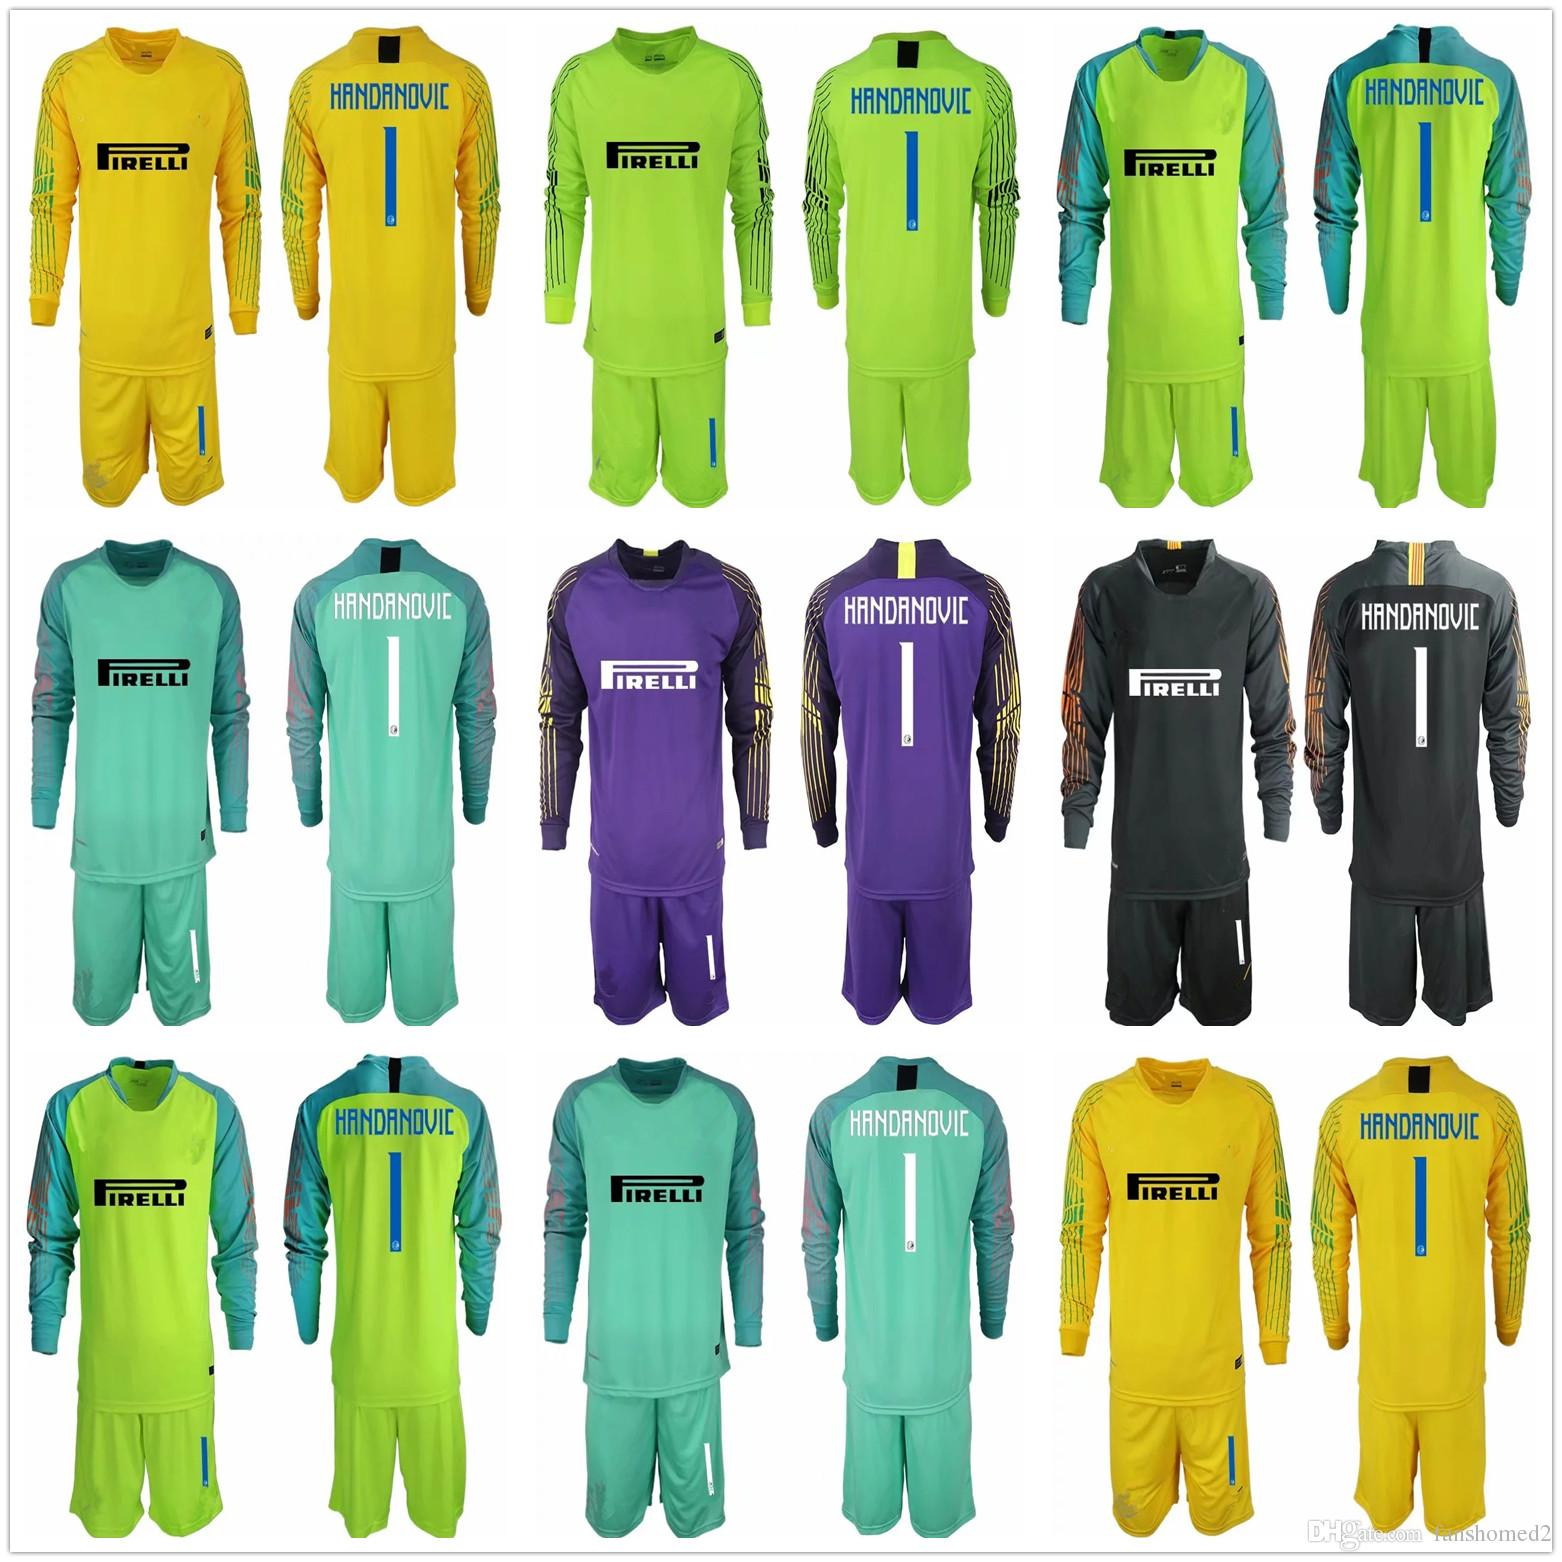 bfd01e212 2019 2018 2019 Adults Long Sleeve Handanovic Goalkeeper Jerseys Soccer Sets  18 19  1 S. Handanovic Goalkeeper Goalie Jerseys Kit Uniform From  Fanshomed2